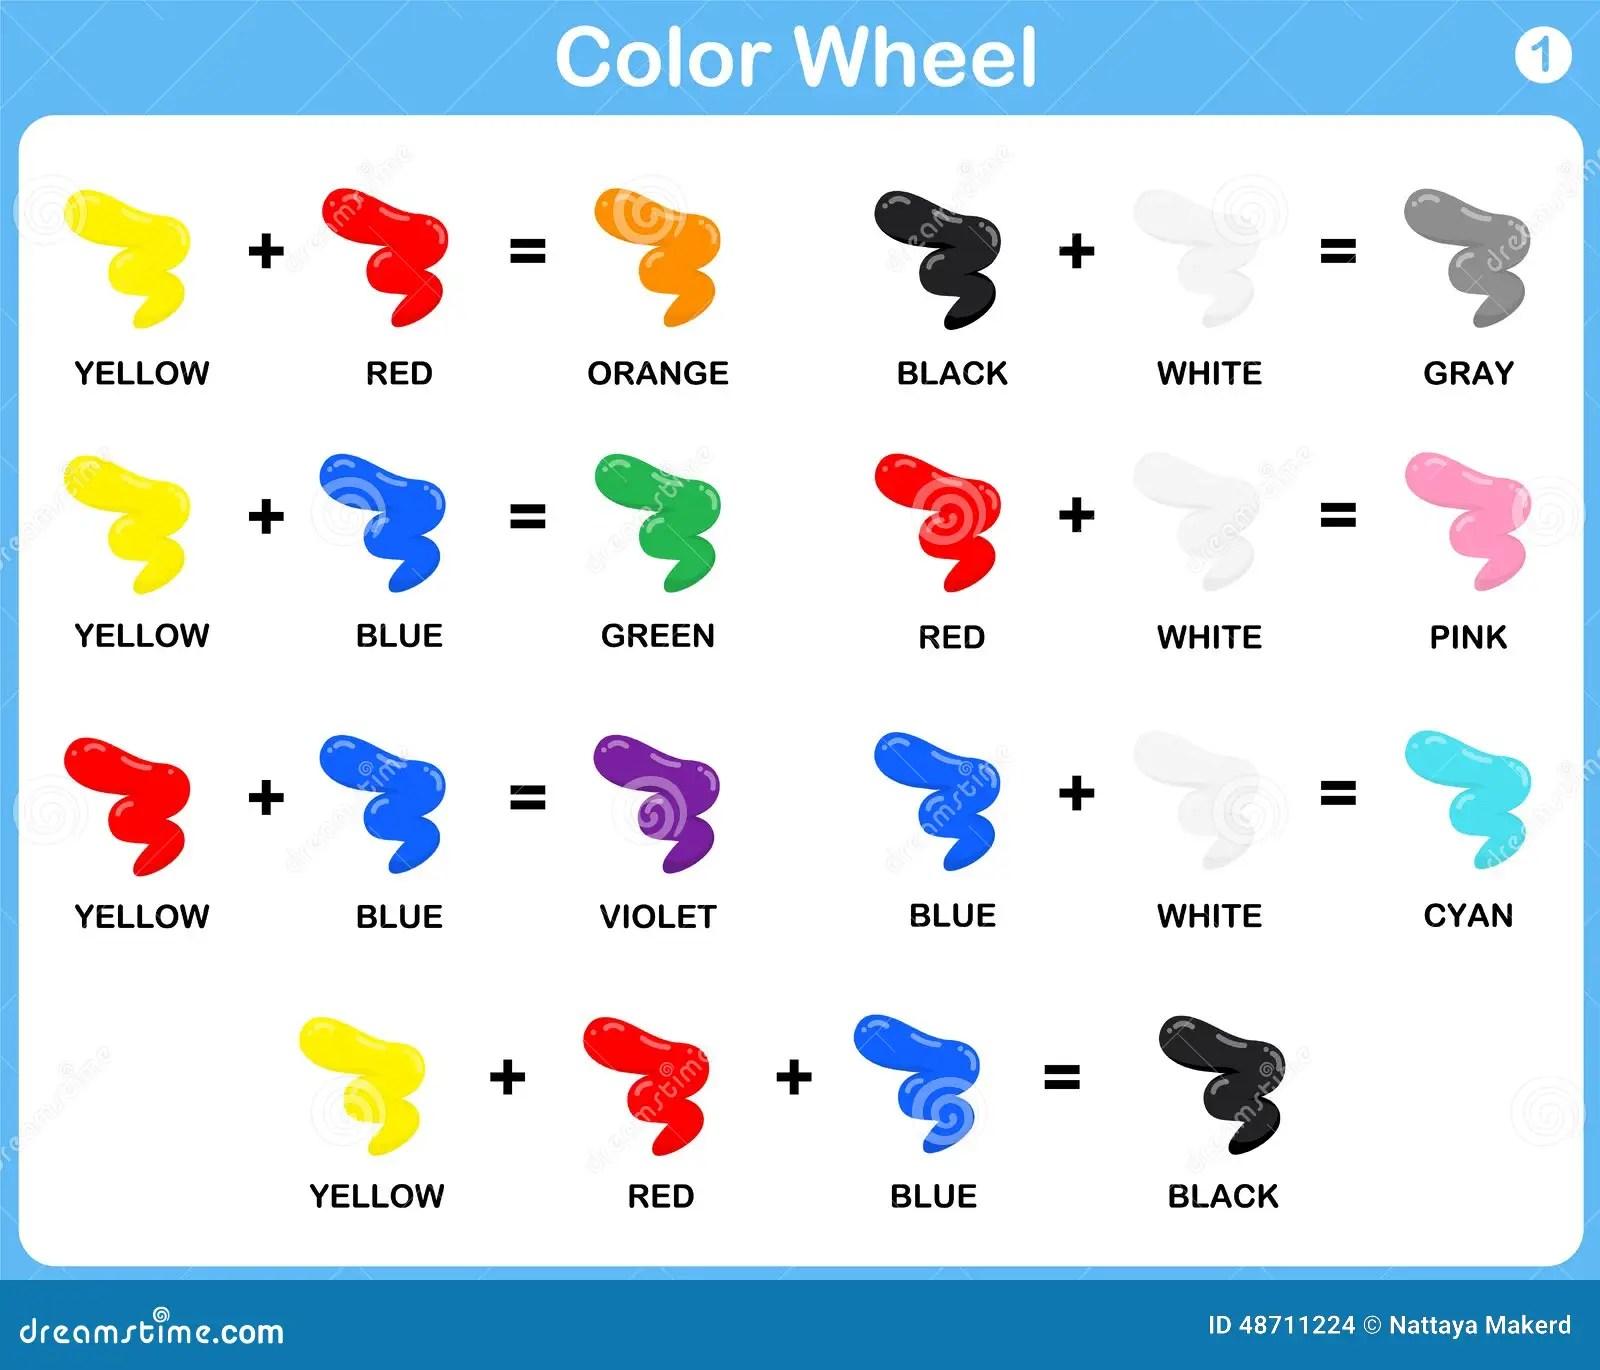 hight resolution of Color Wheel Worksheet For Kids Stock Vector - Illustration of grade